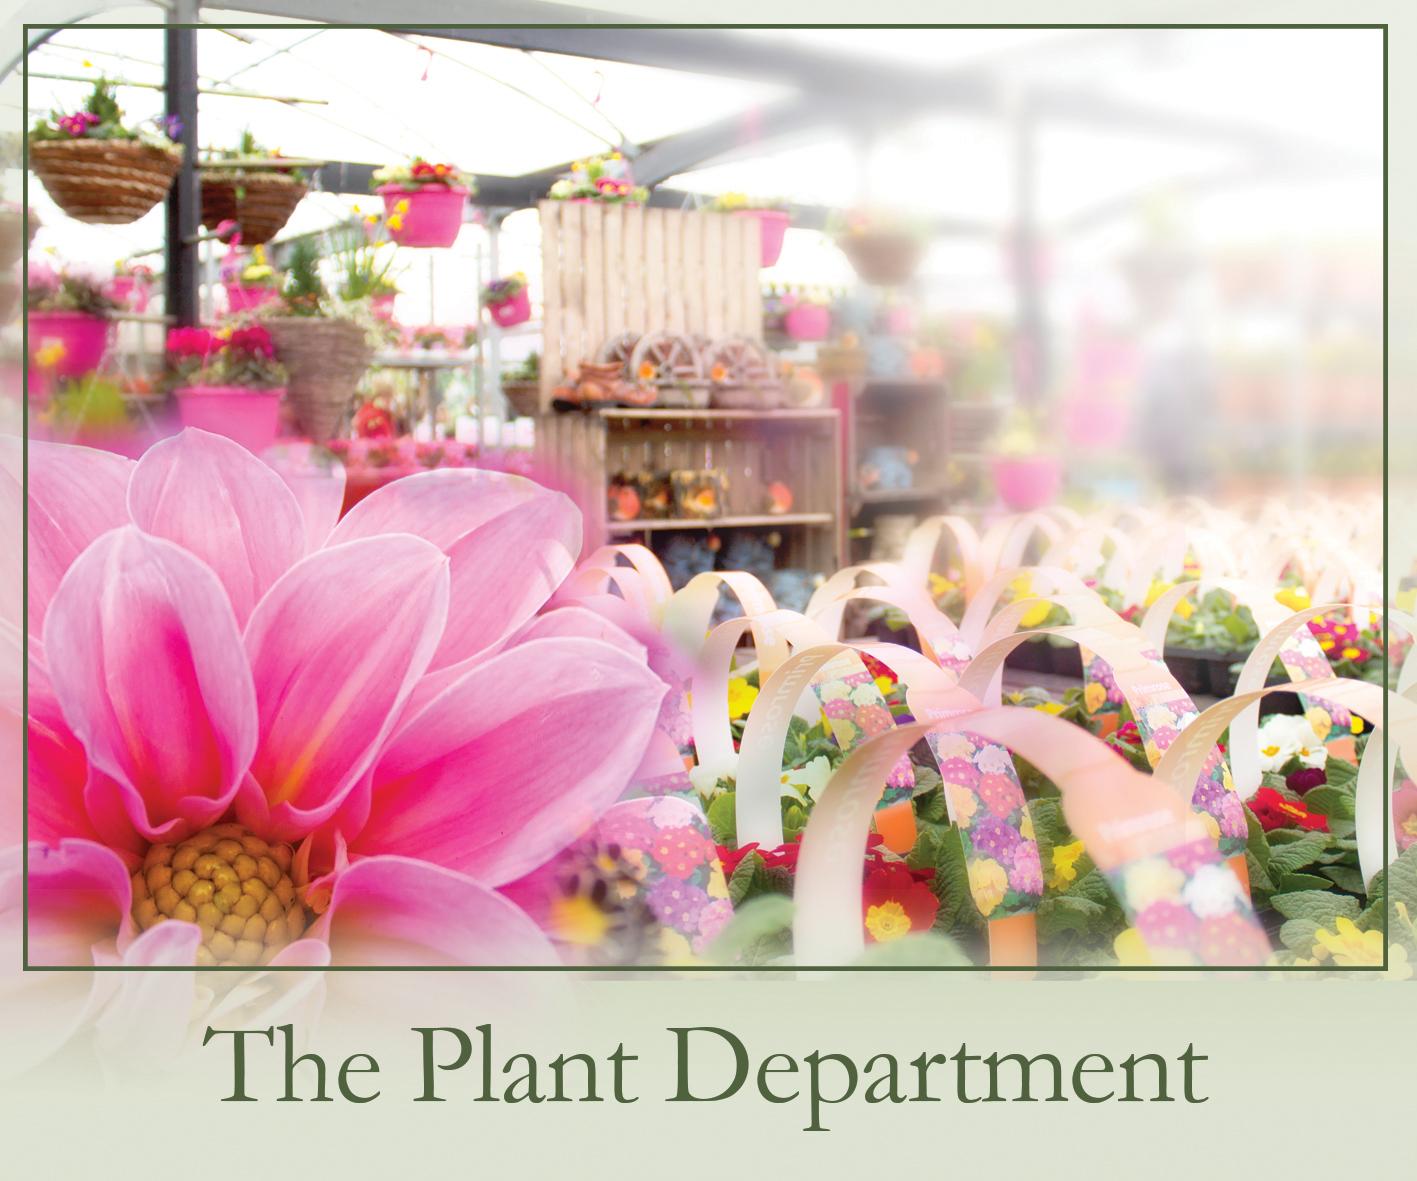 garden furniture, garden shop, garden tools